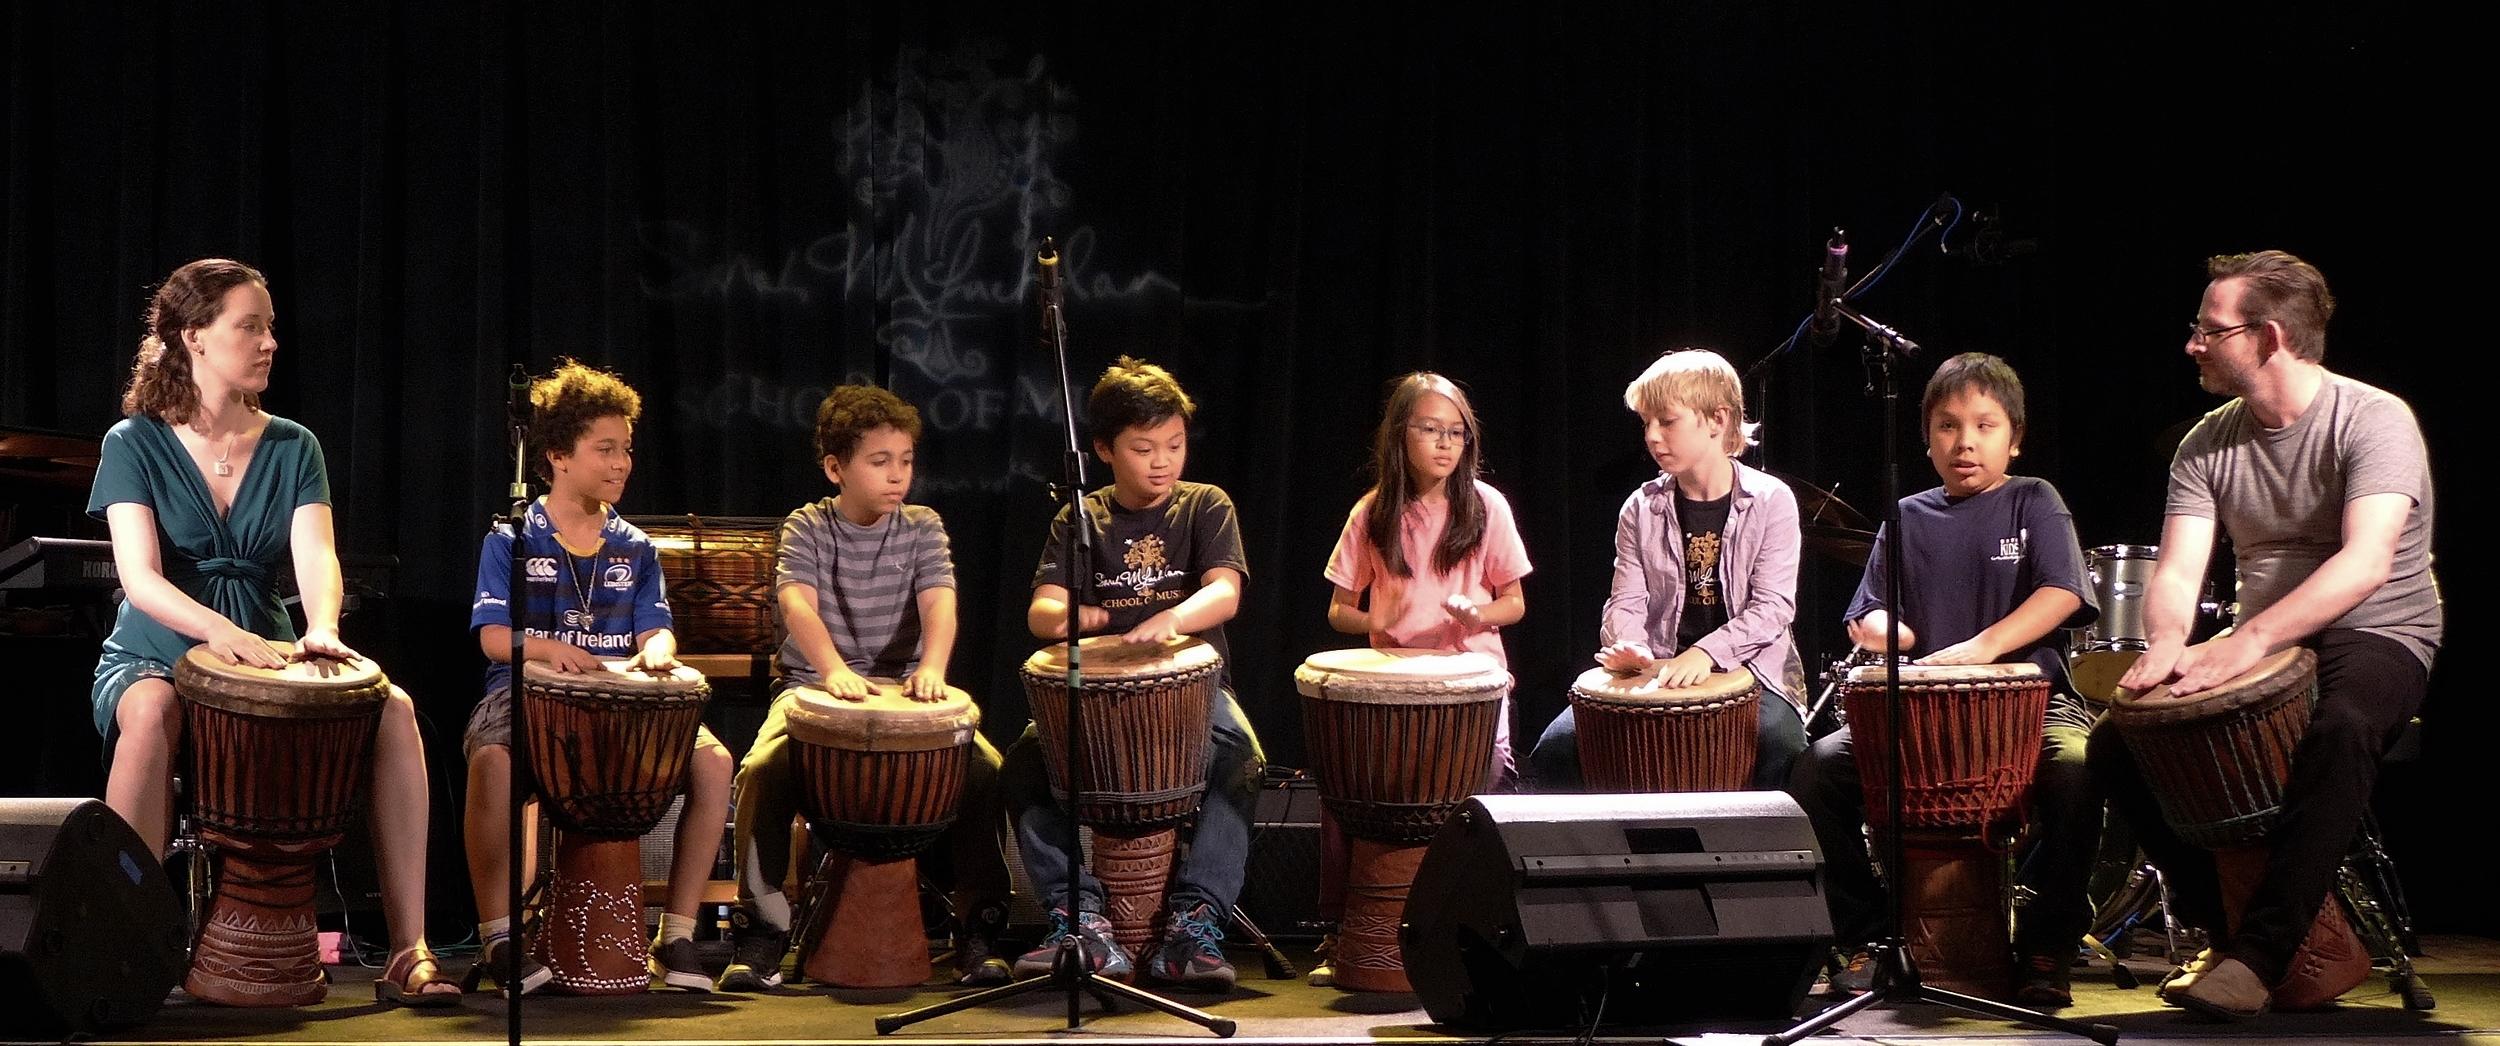 percussion1.jpeg